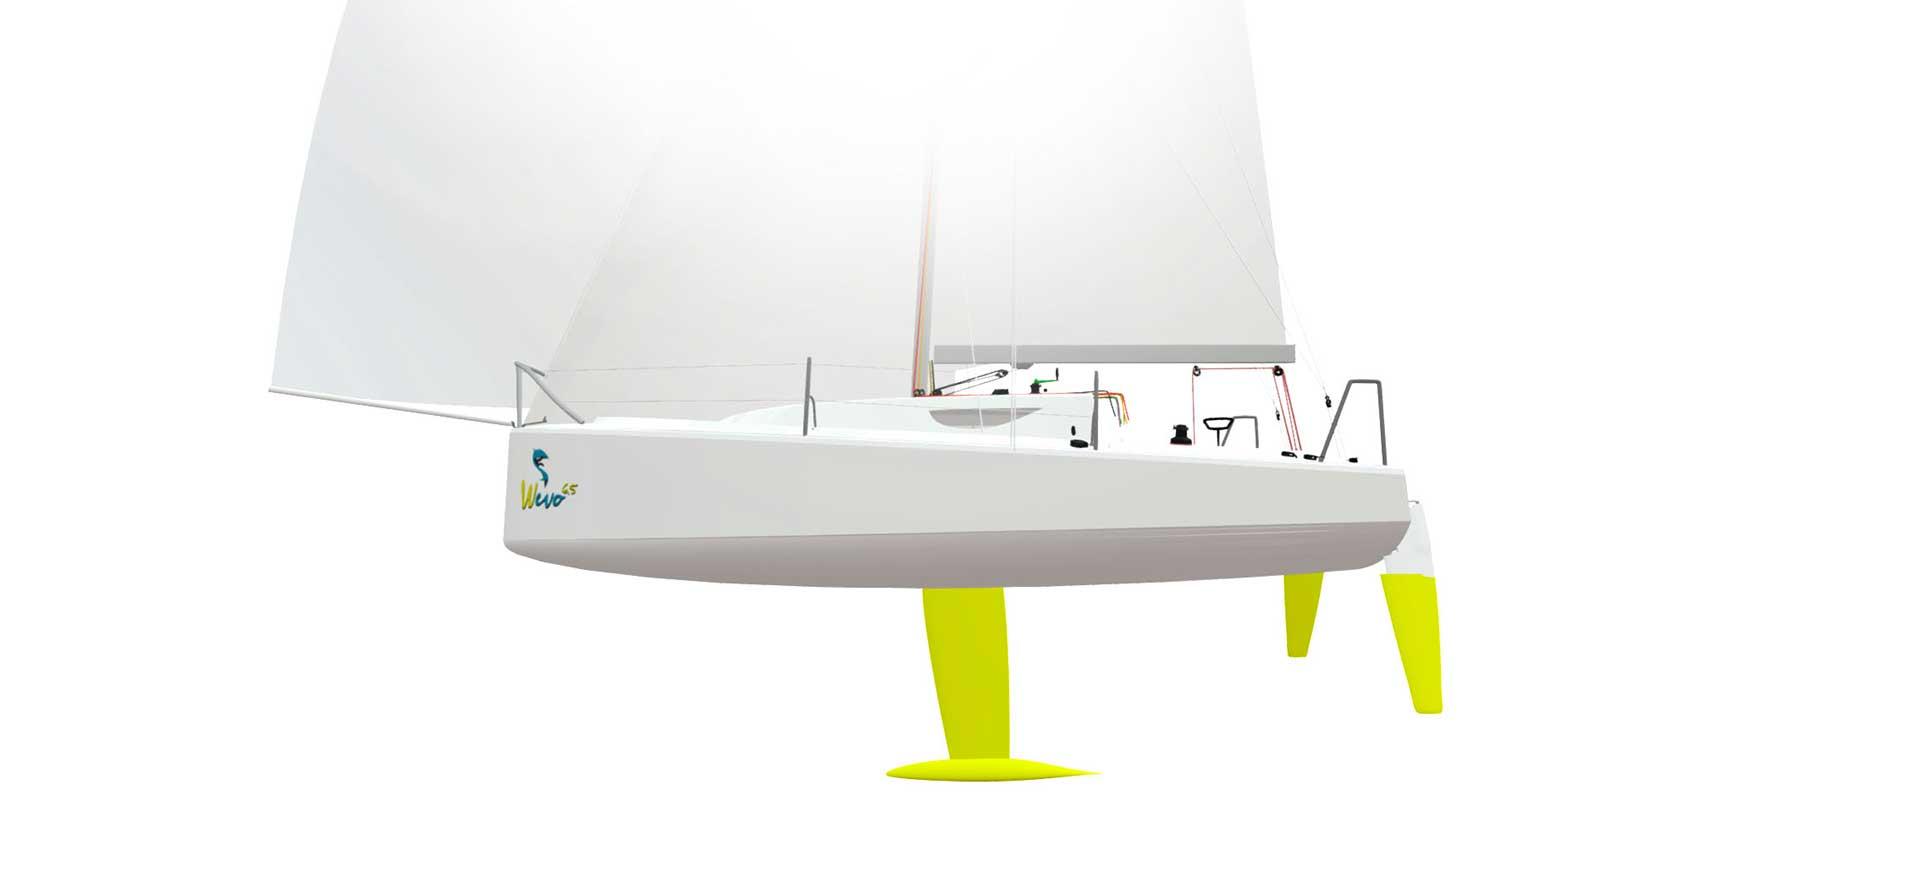 Mini-Transat 2021